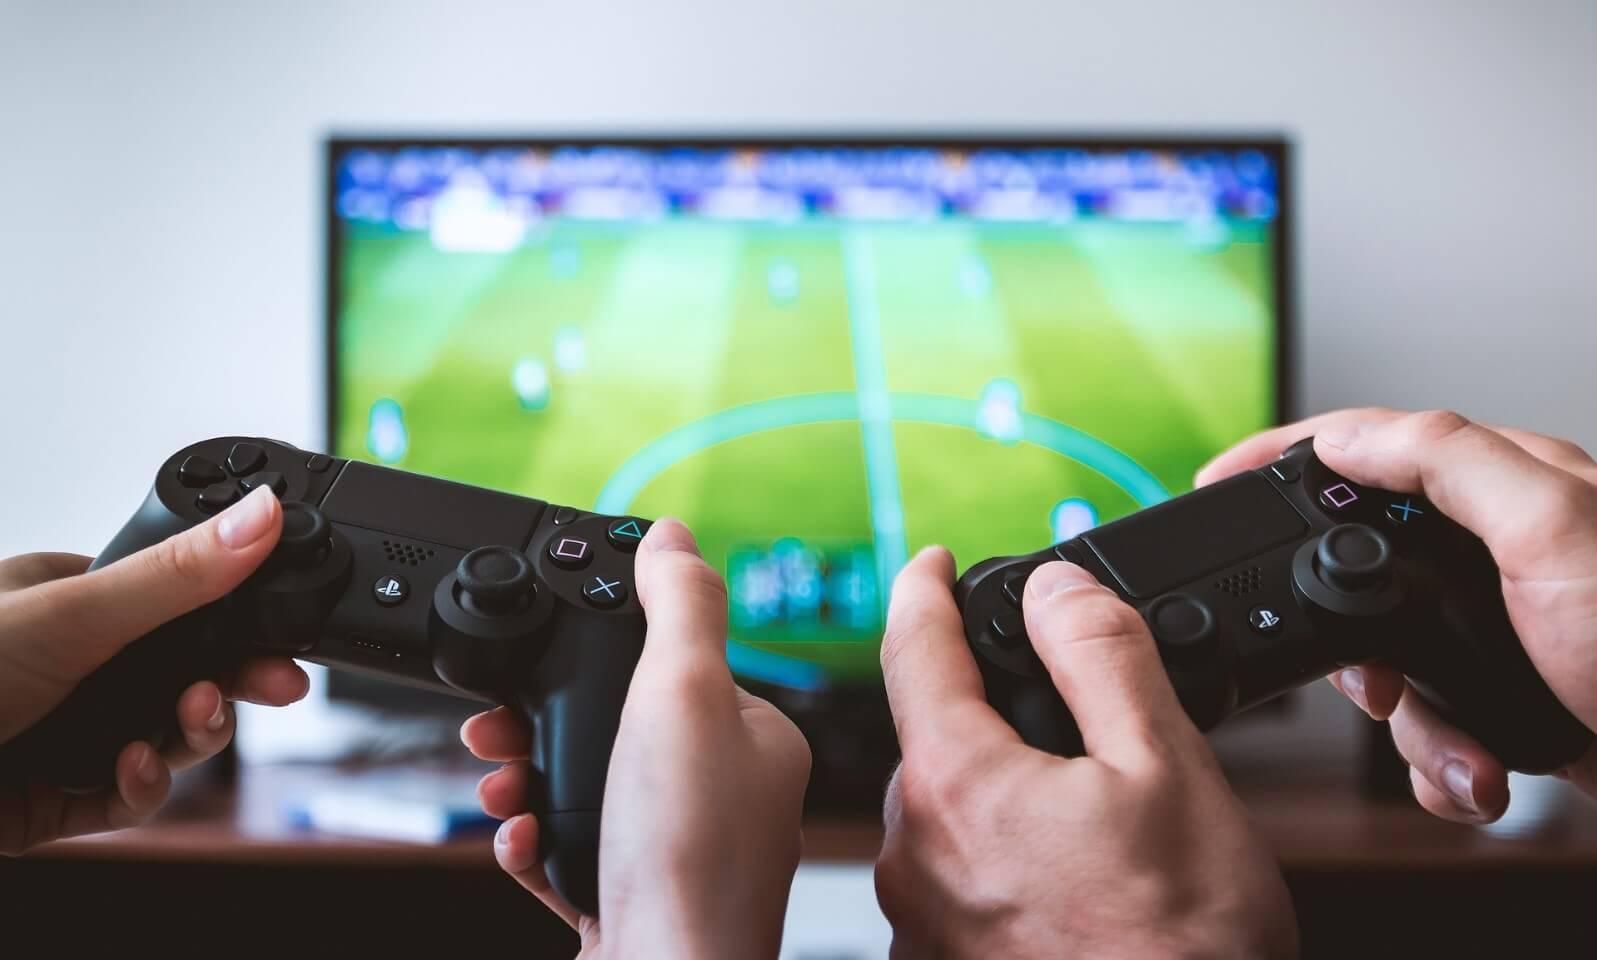 hospitalizado jugar videojuego fortnite-Digital de León